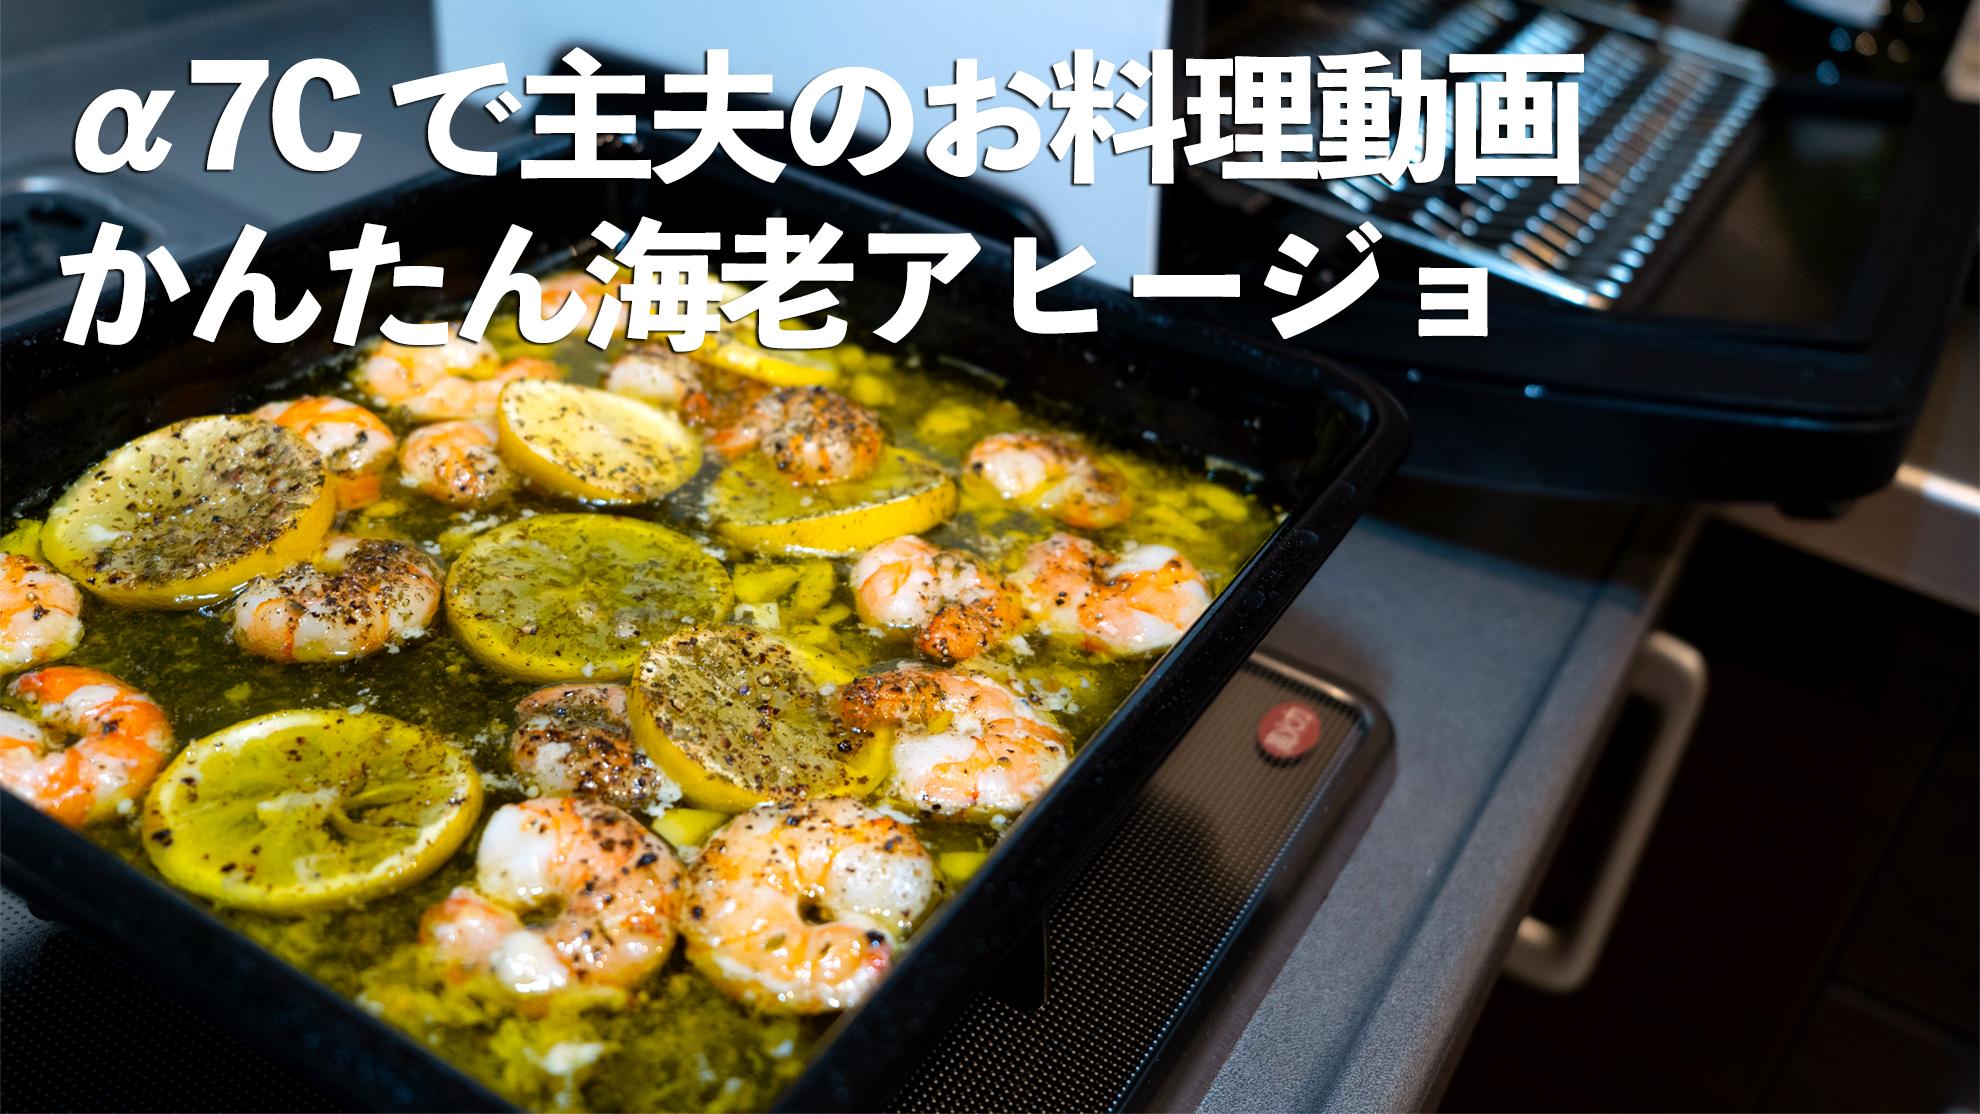 a7Cで主夫のお料理動画 -かんたん海老アヒージョ-